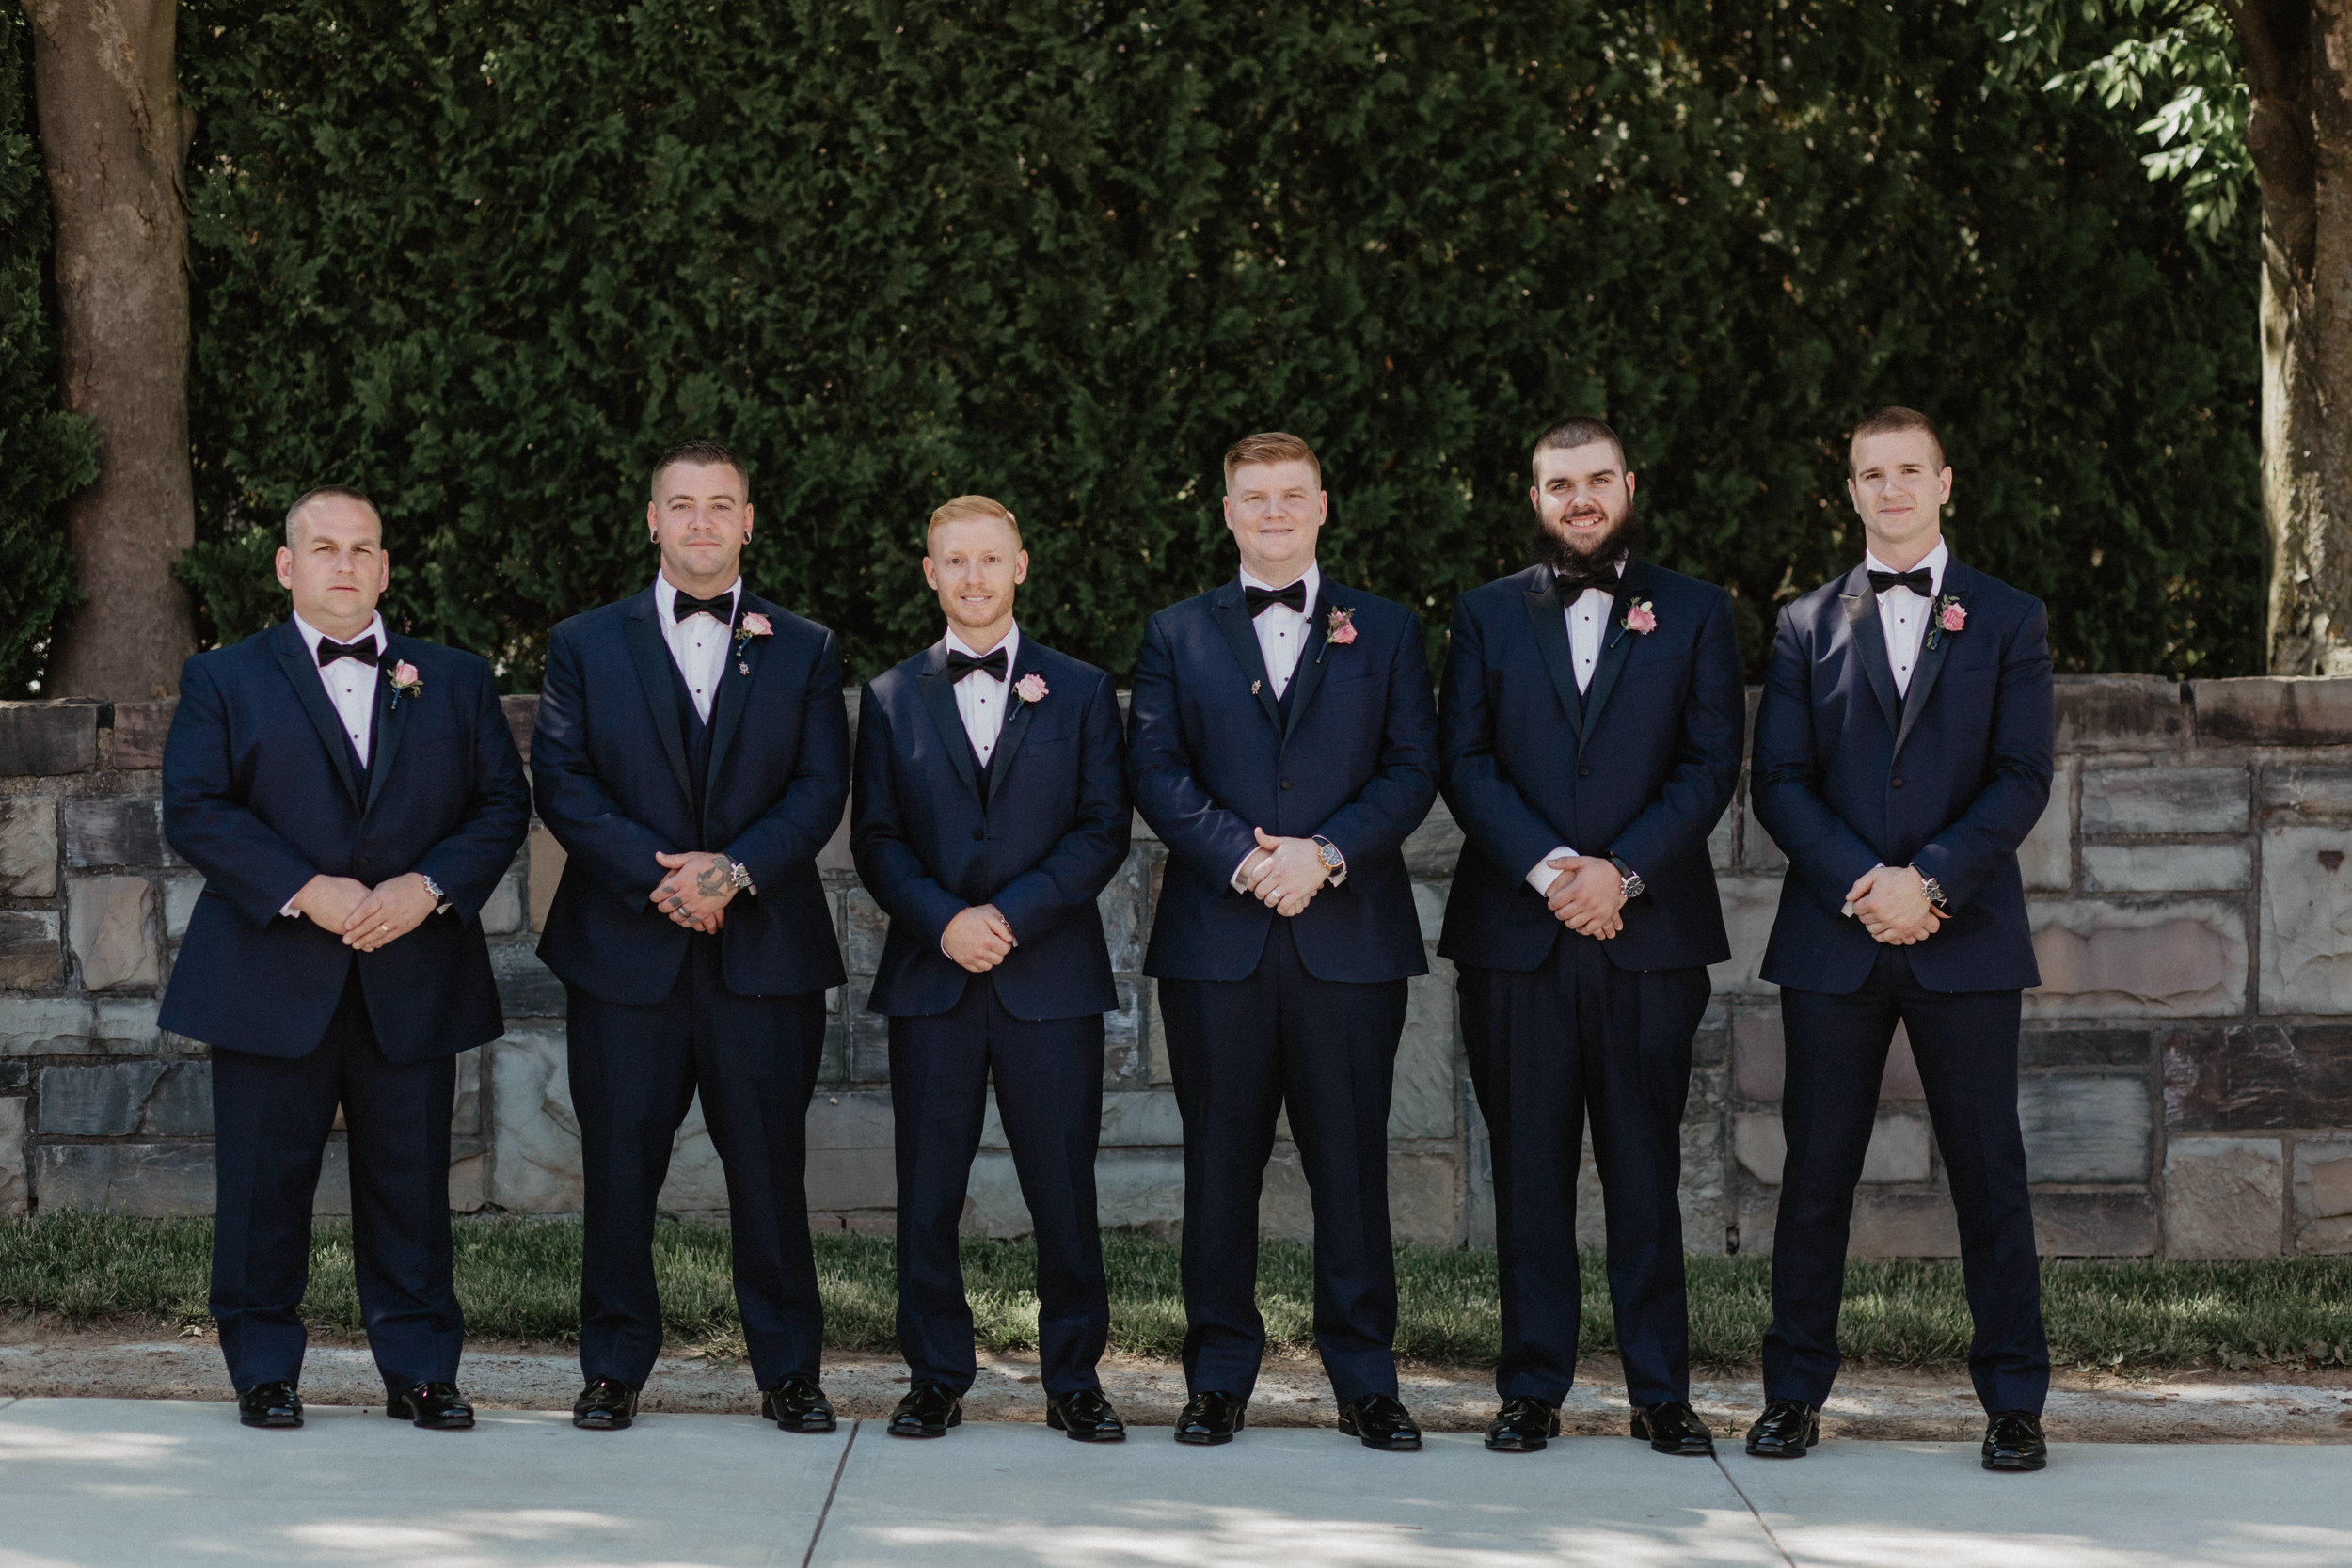 albany-new-york-wedding-31.jpg